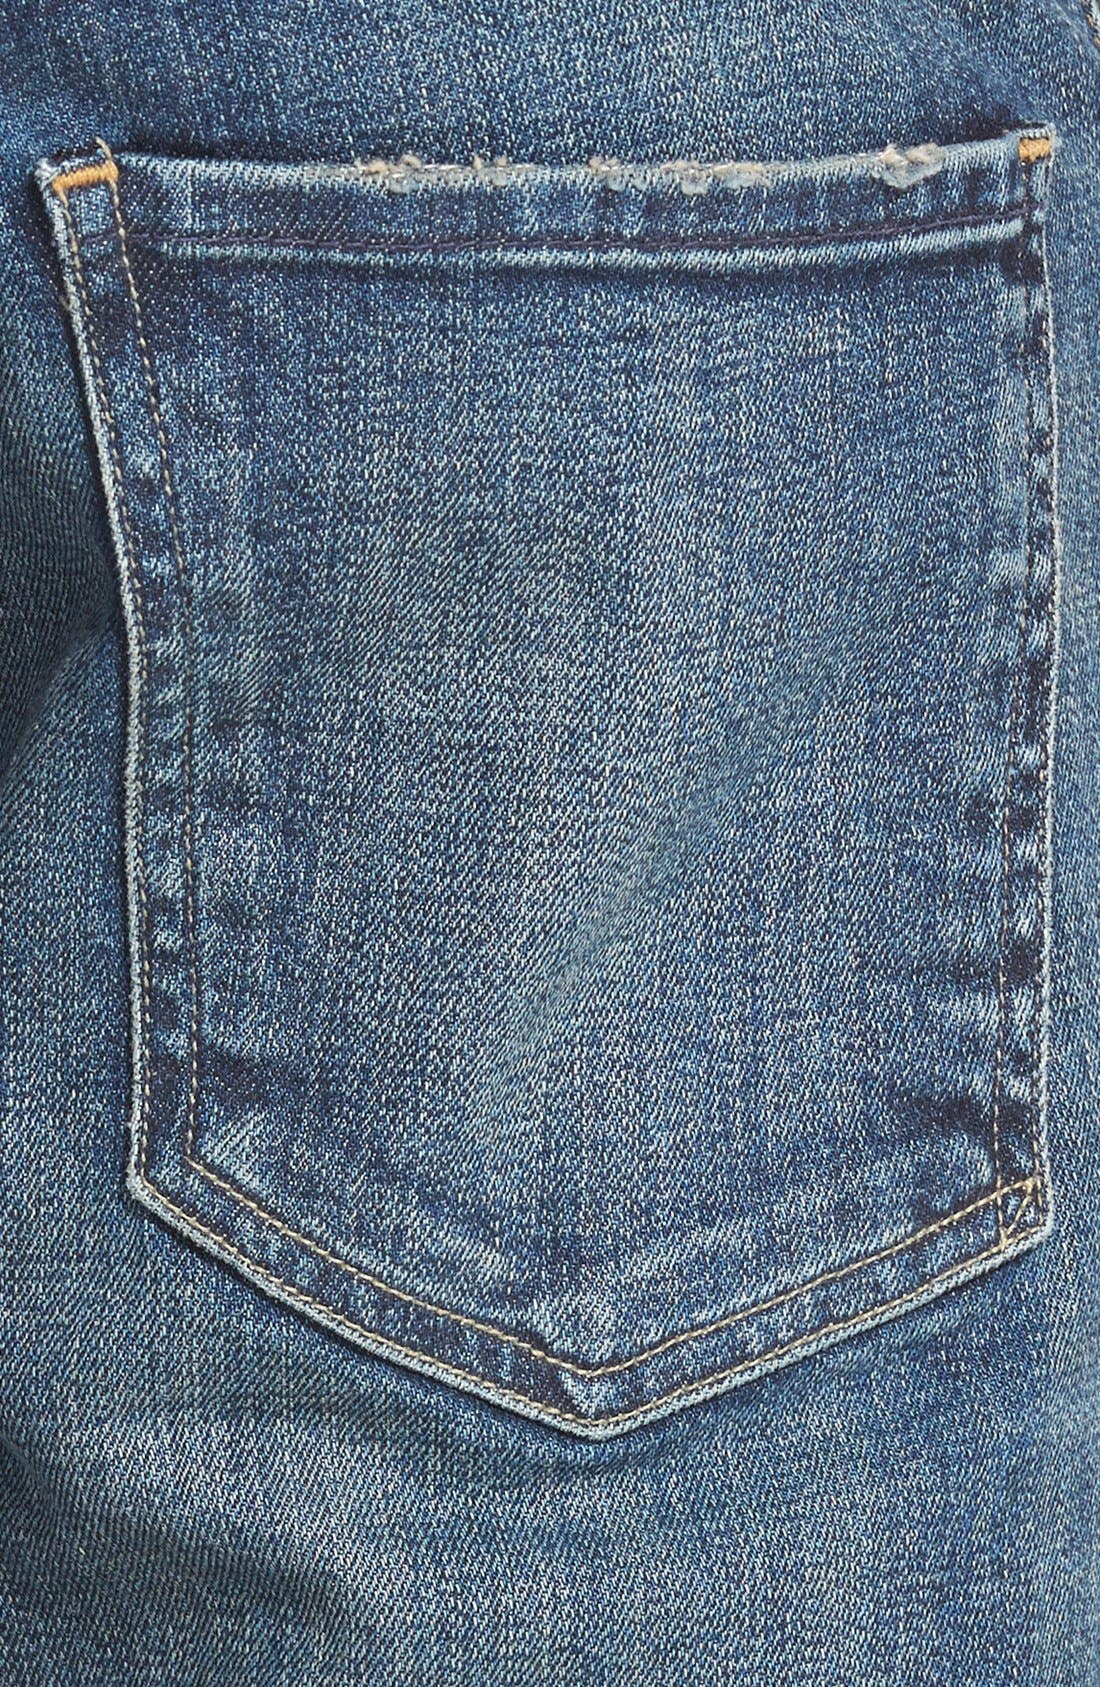 'Core' Slim Straight Leg Jeans,                             Alternate thumbnail 2, color,